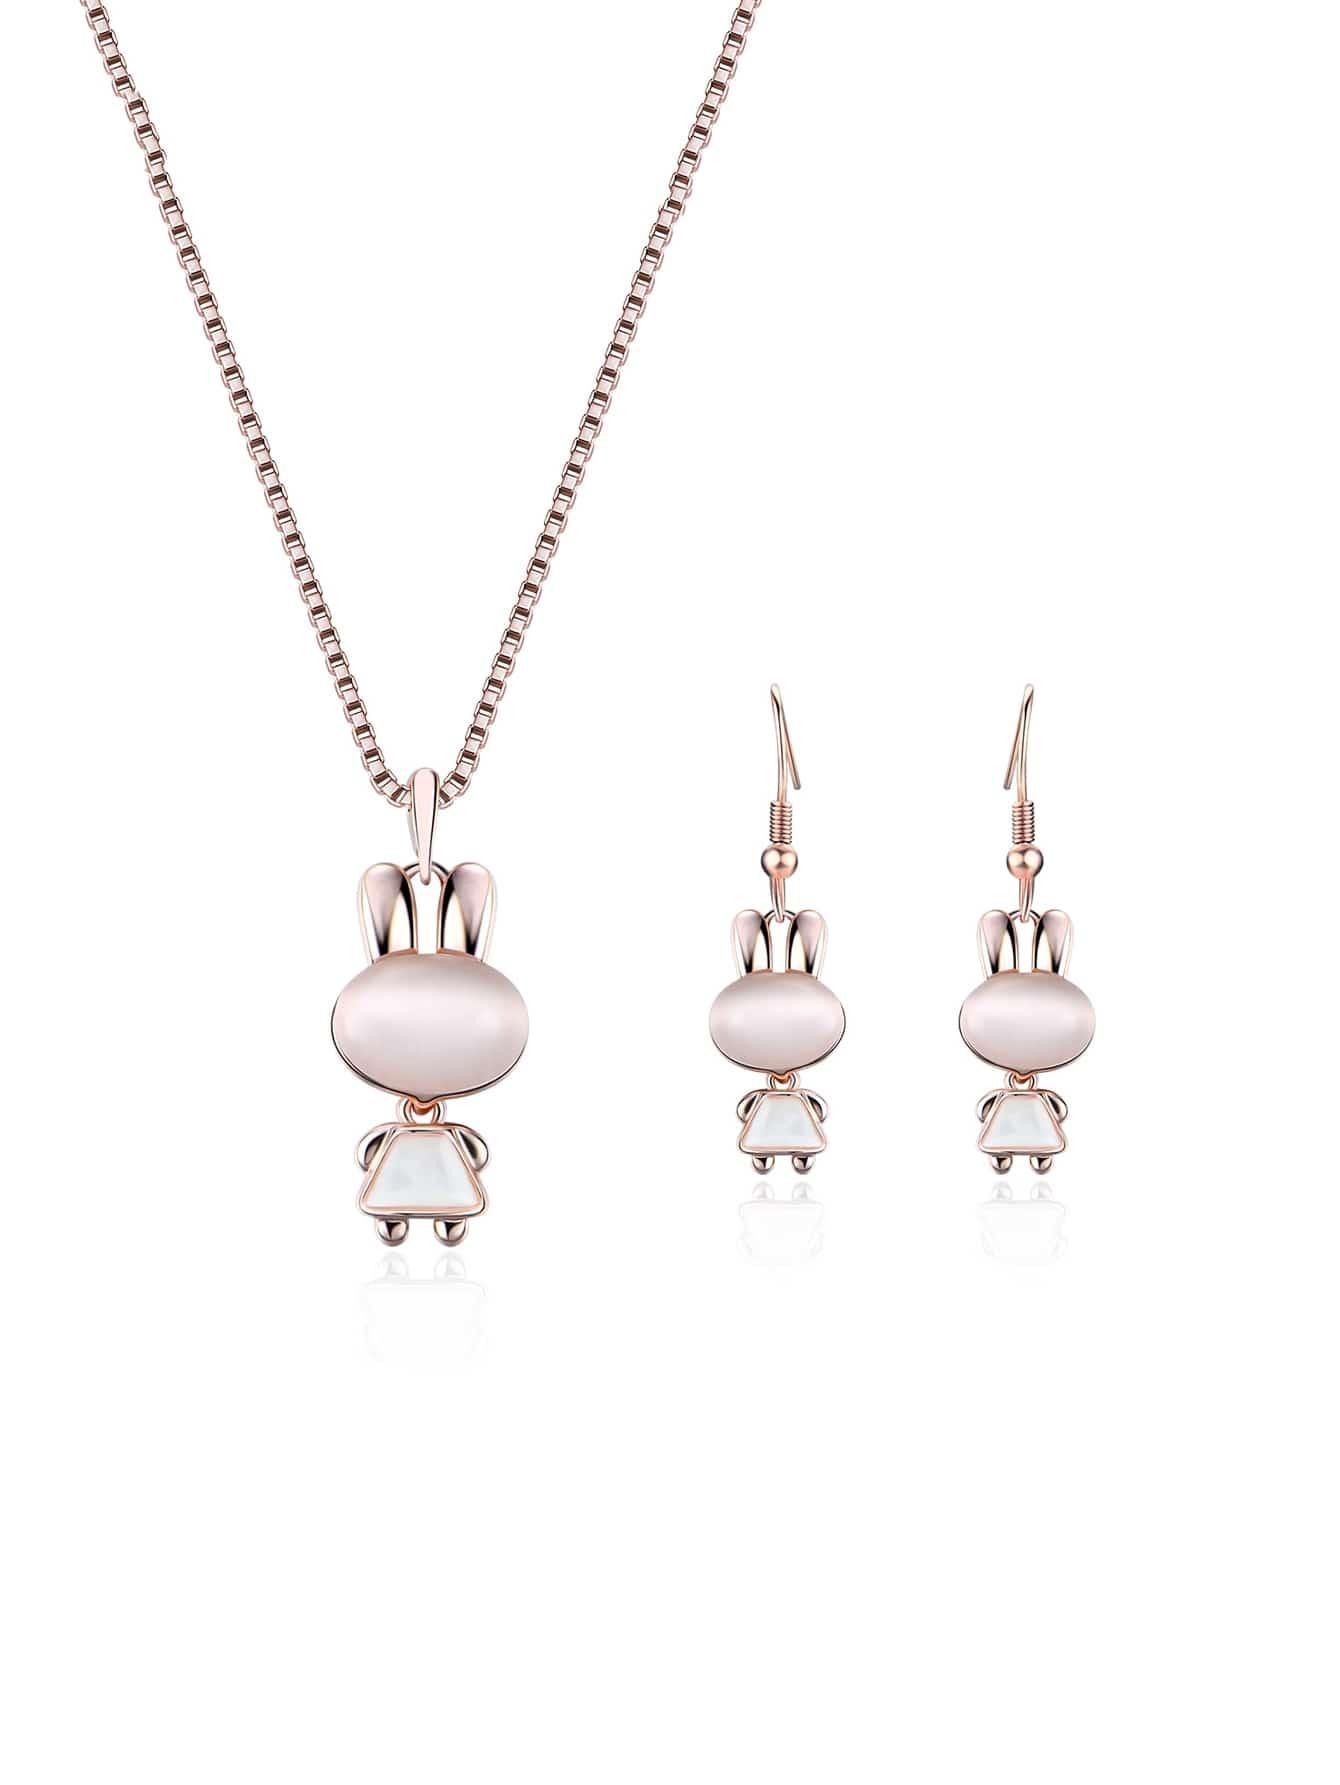 Kaninchen Anhänger Halskette & Ohrringe Set